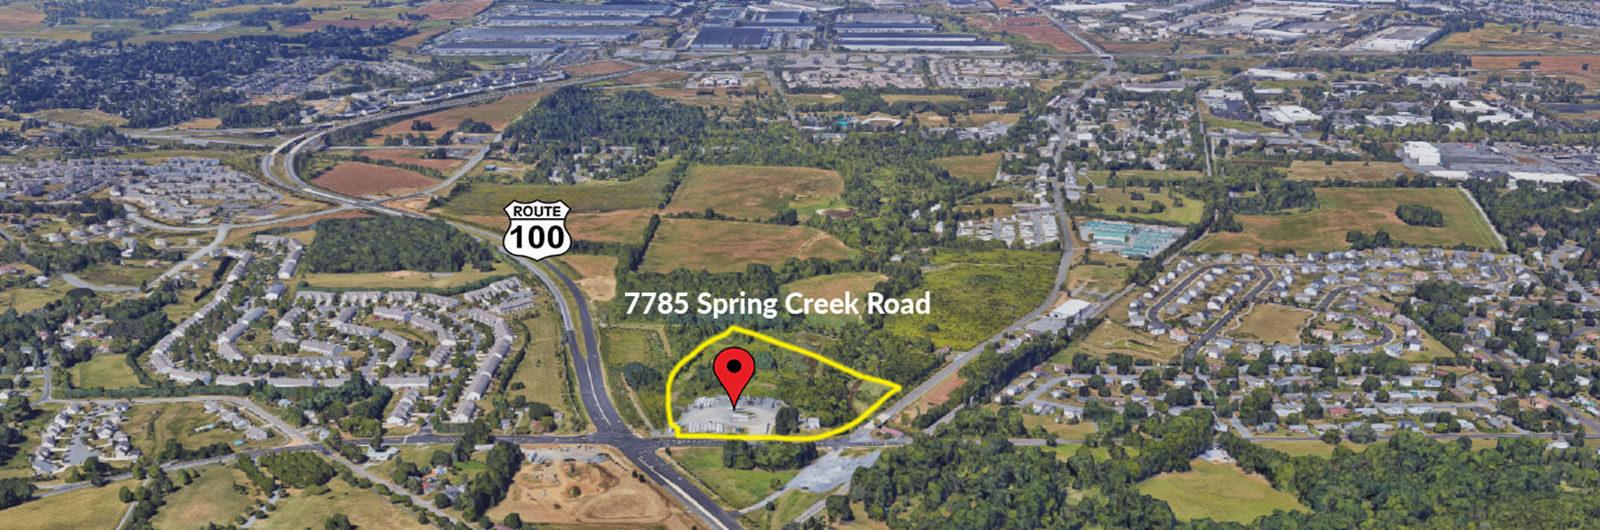 7785 Spring Creek Road